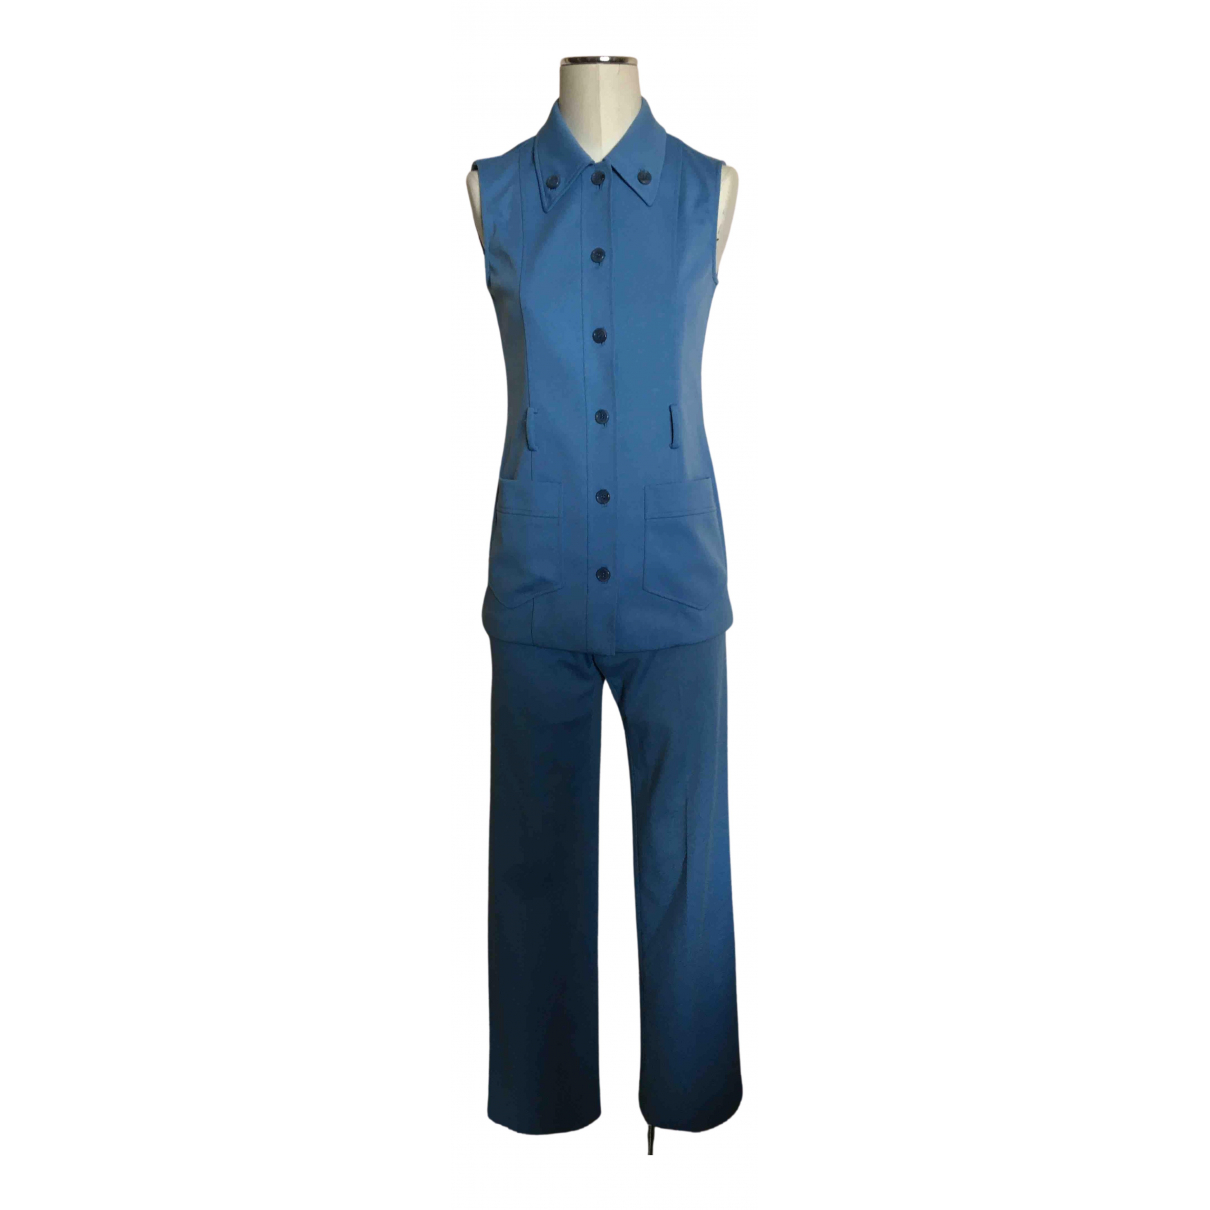 Prada N Turquoise dress for Women 42 IT